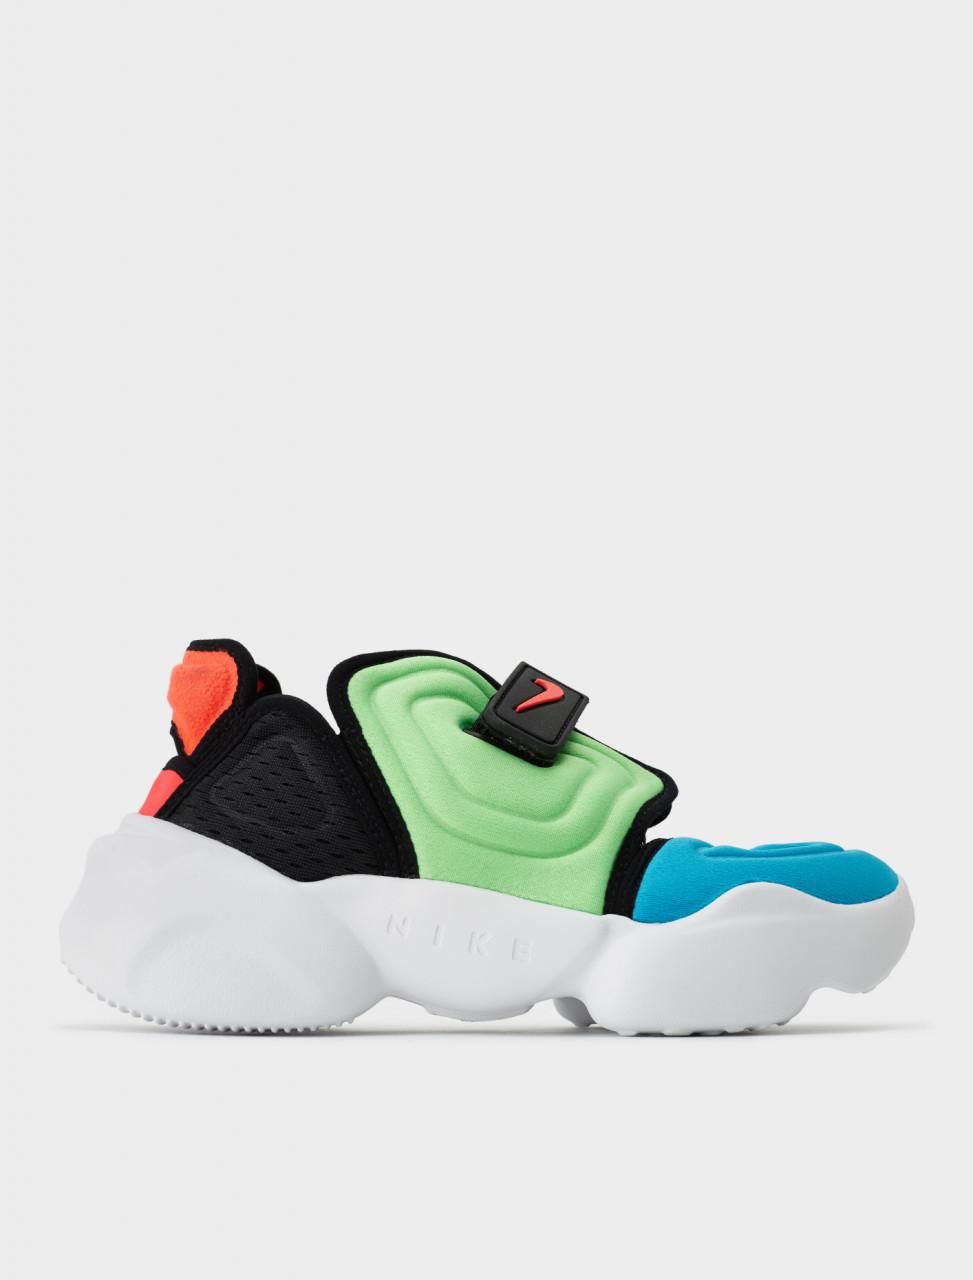 Nike Womens Aqua Rift Sneaker Sandal in Blue Fury Side